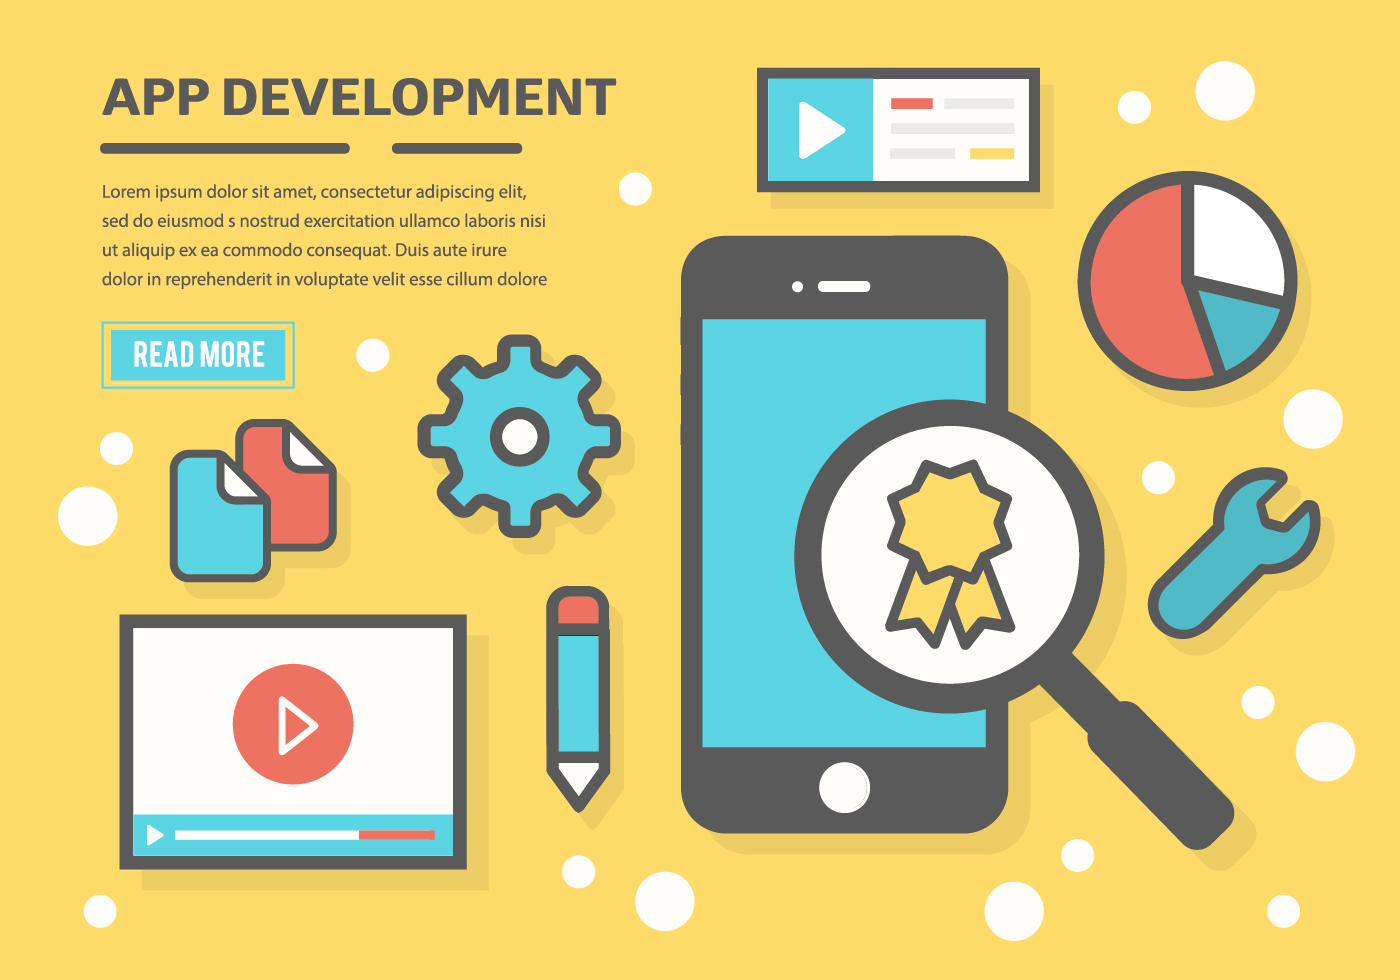 Free App Development Vector Background Download Free